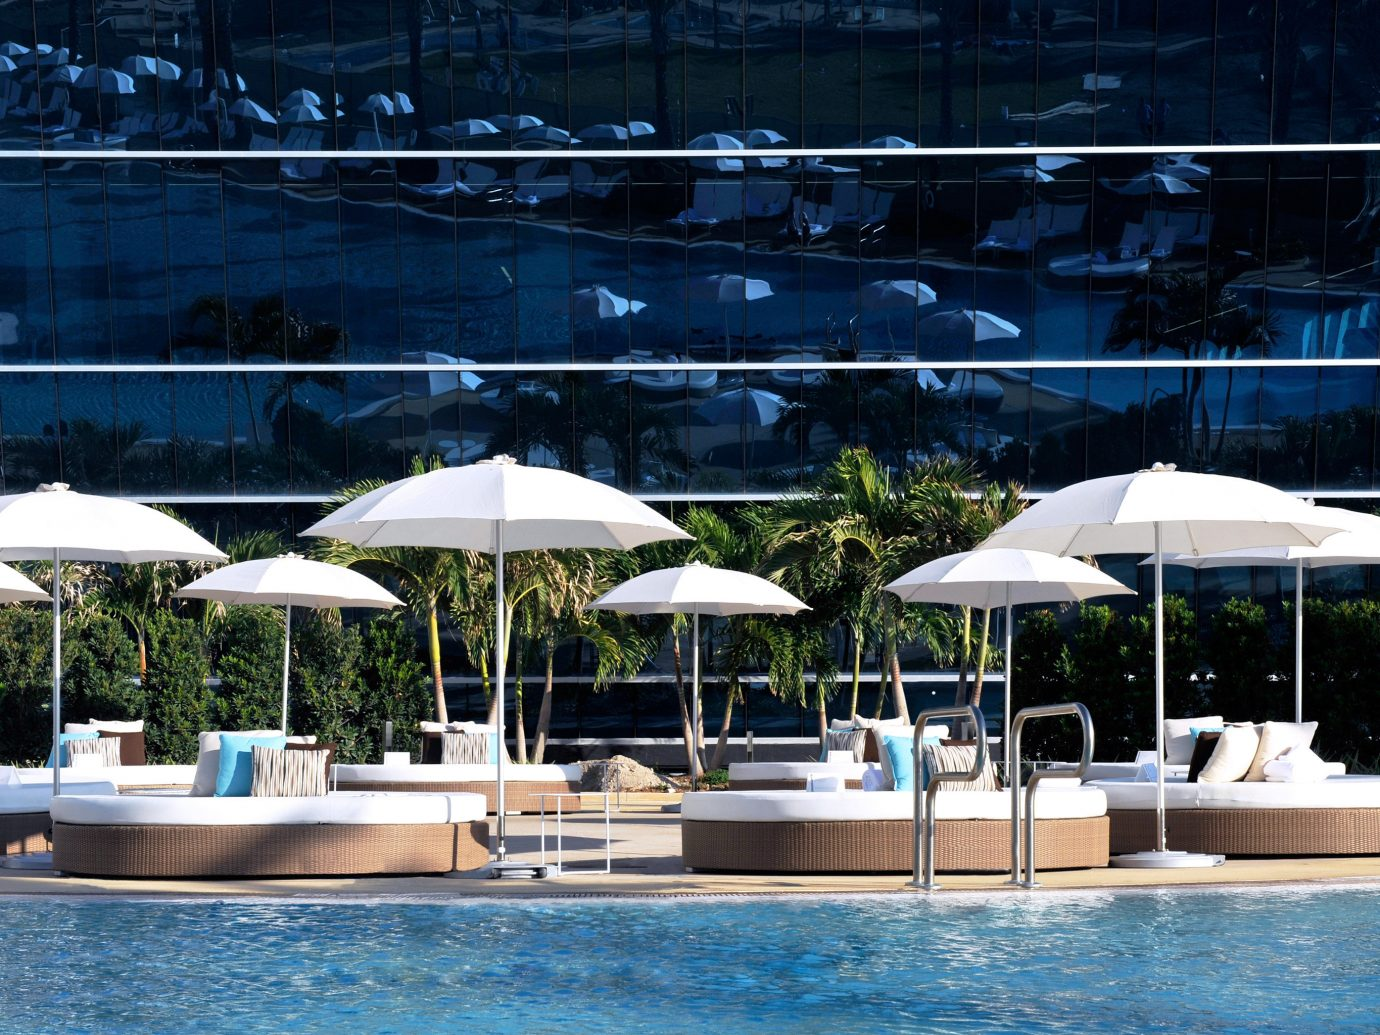 Lounge Play Pool Resort Trip Ideas umbrella outdoor chair swimming pool marina dock